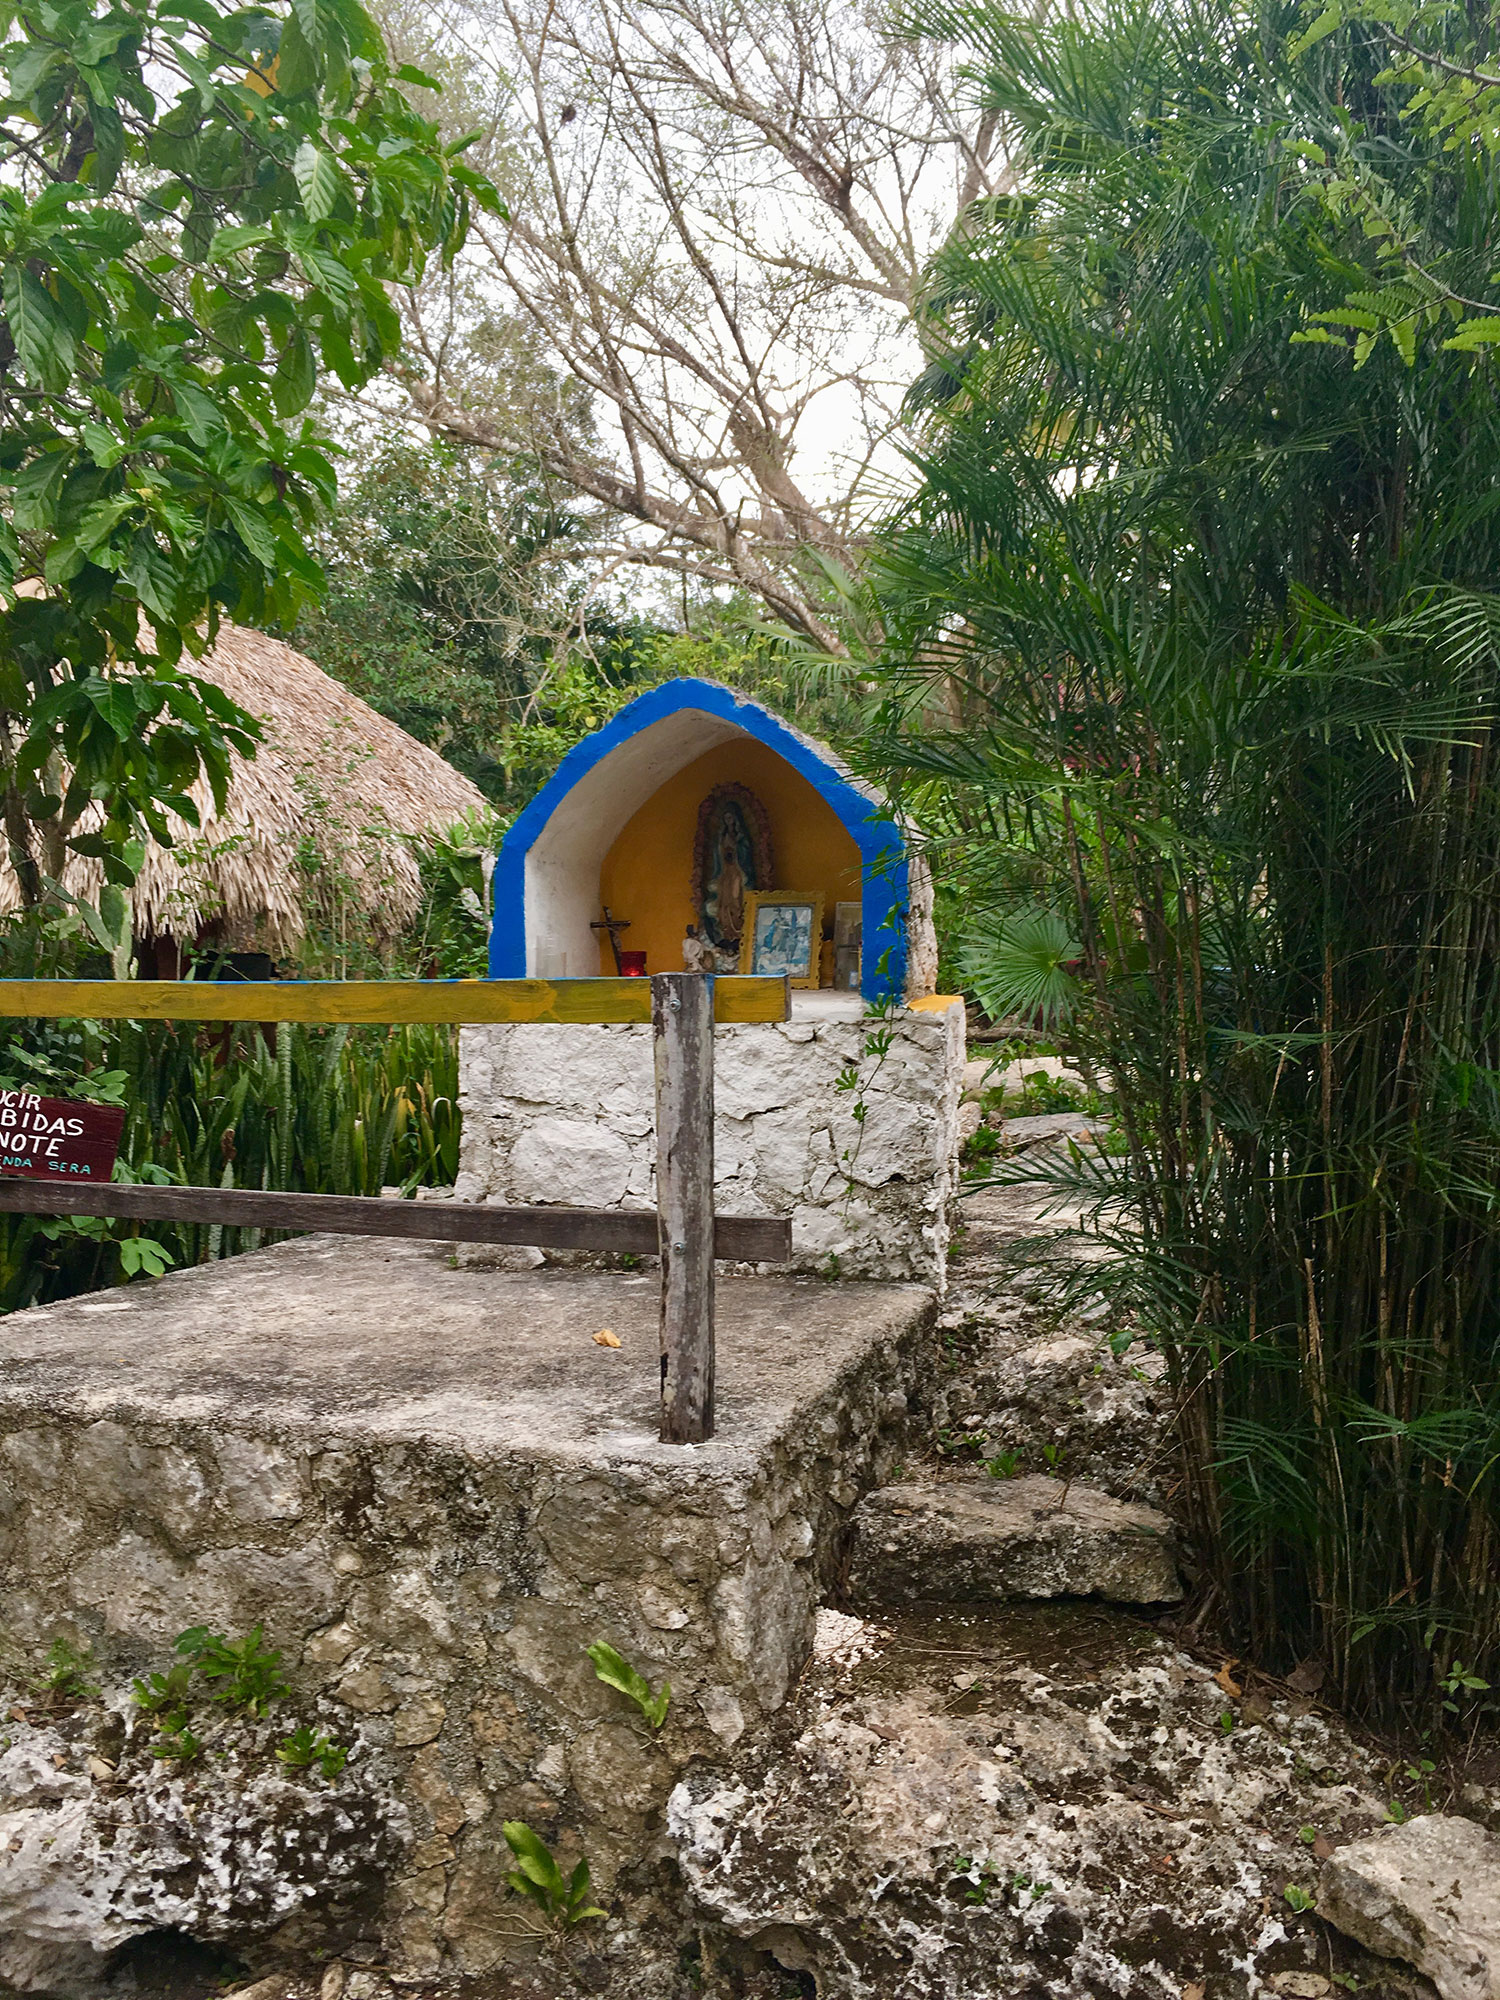 The village altar, by Boca 1.